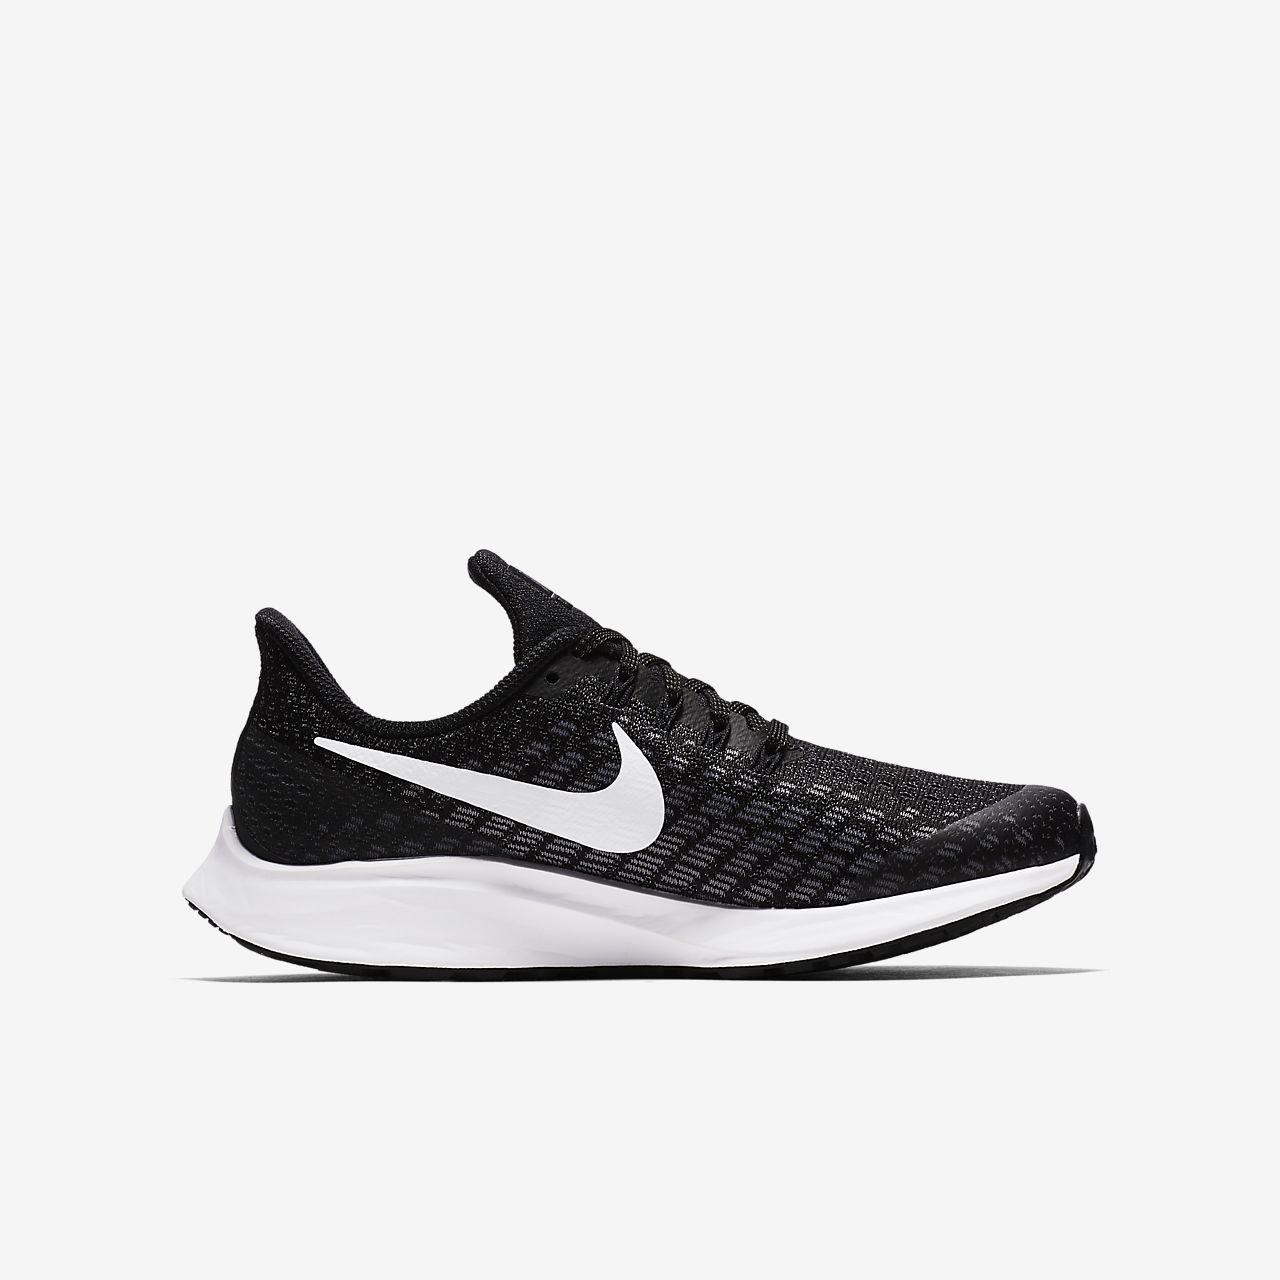 5f6907d8e7e Nike Air Zoom Pegasus 35 Younger Older Kids  Running Shoe. Nike.com AU